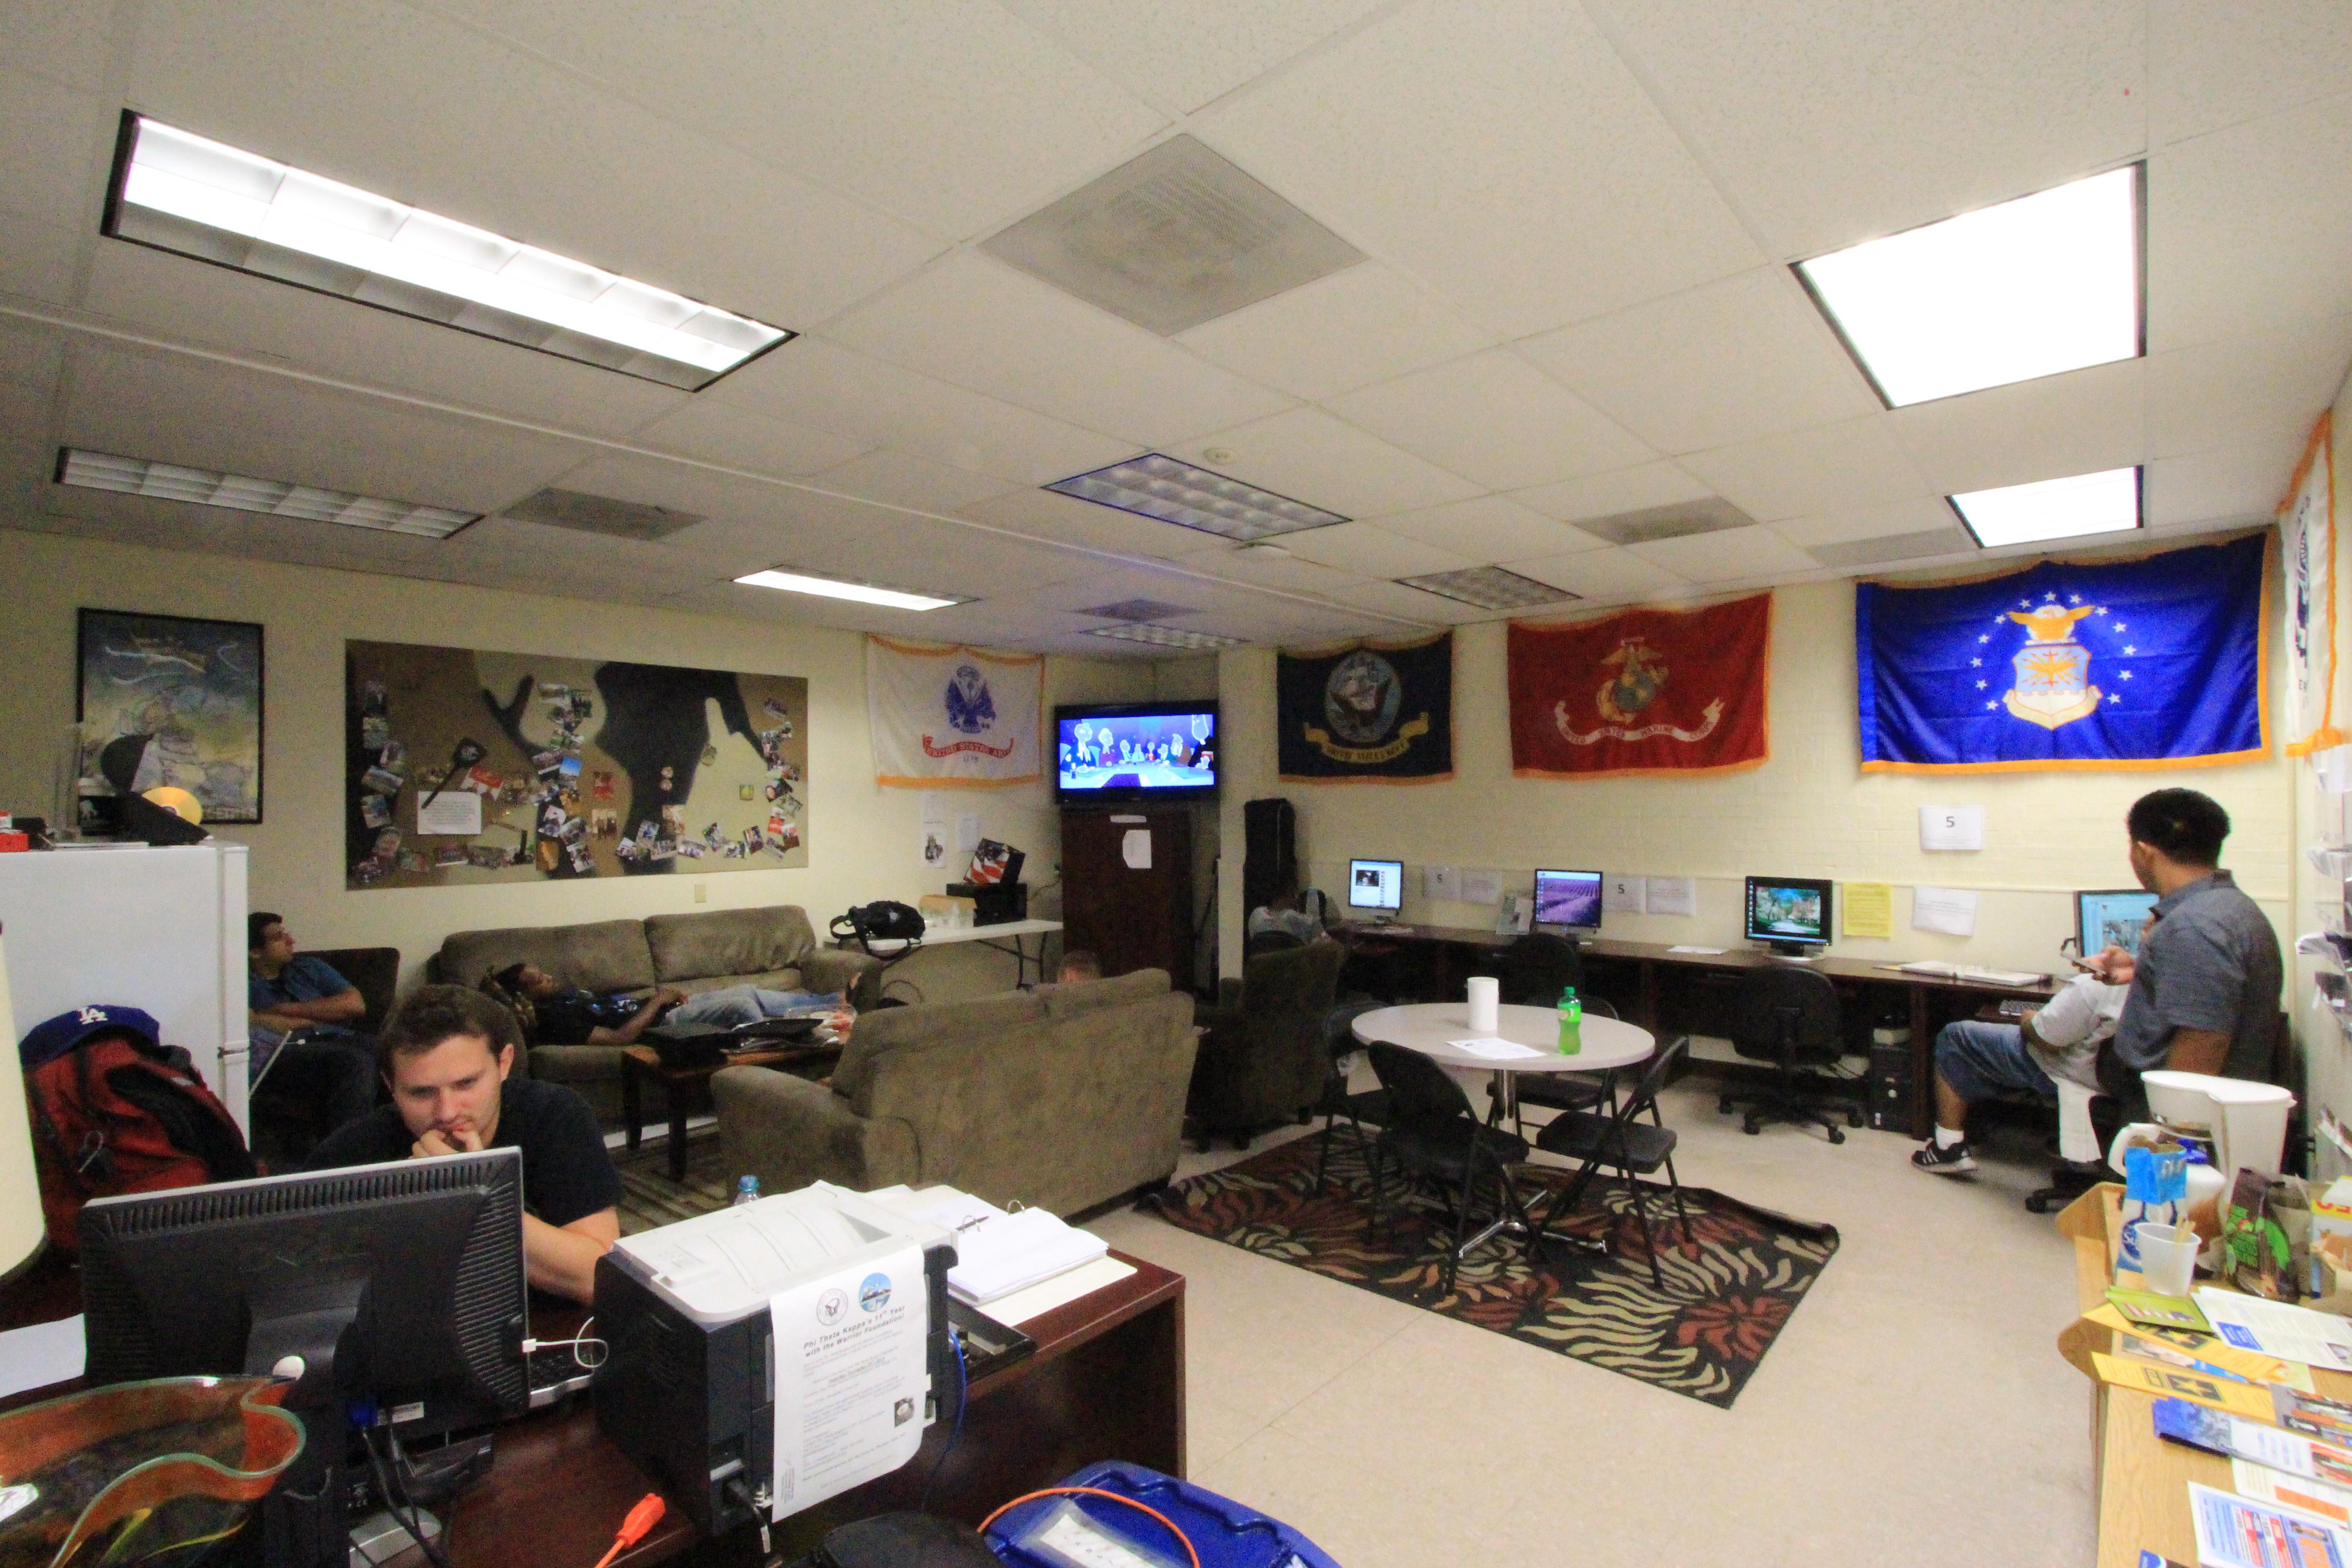 Sept 16, 2014, Palomar College Veteran Volunteer Jonathan Stroud (Marine Veteran) watches over the lounge.